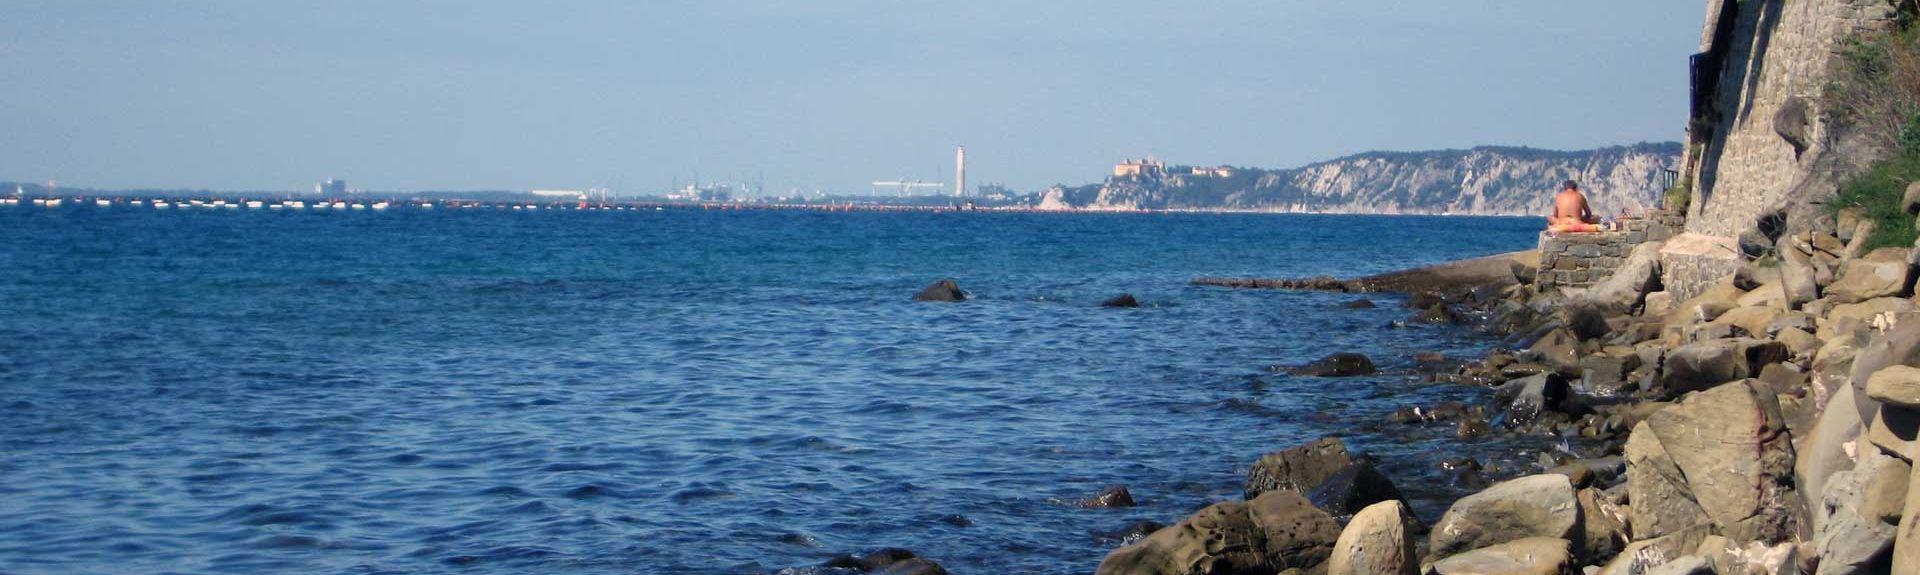 Trieste Provinz, Friaul-Julisch Venetien, Italien